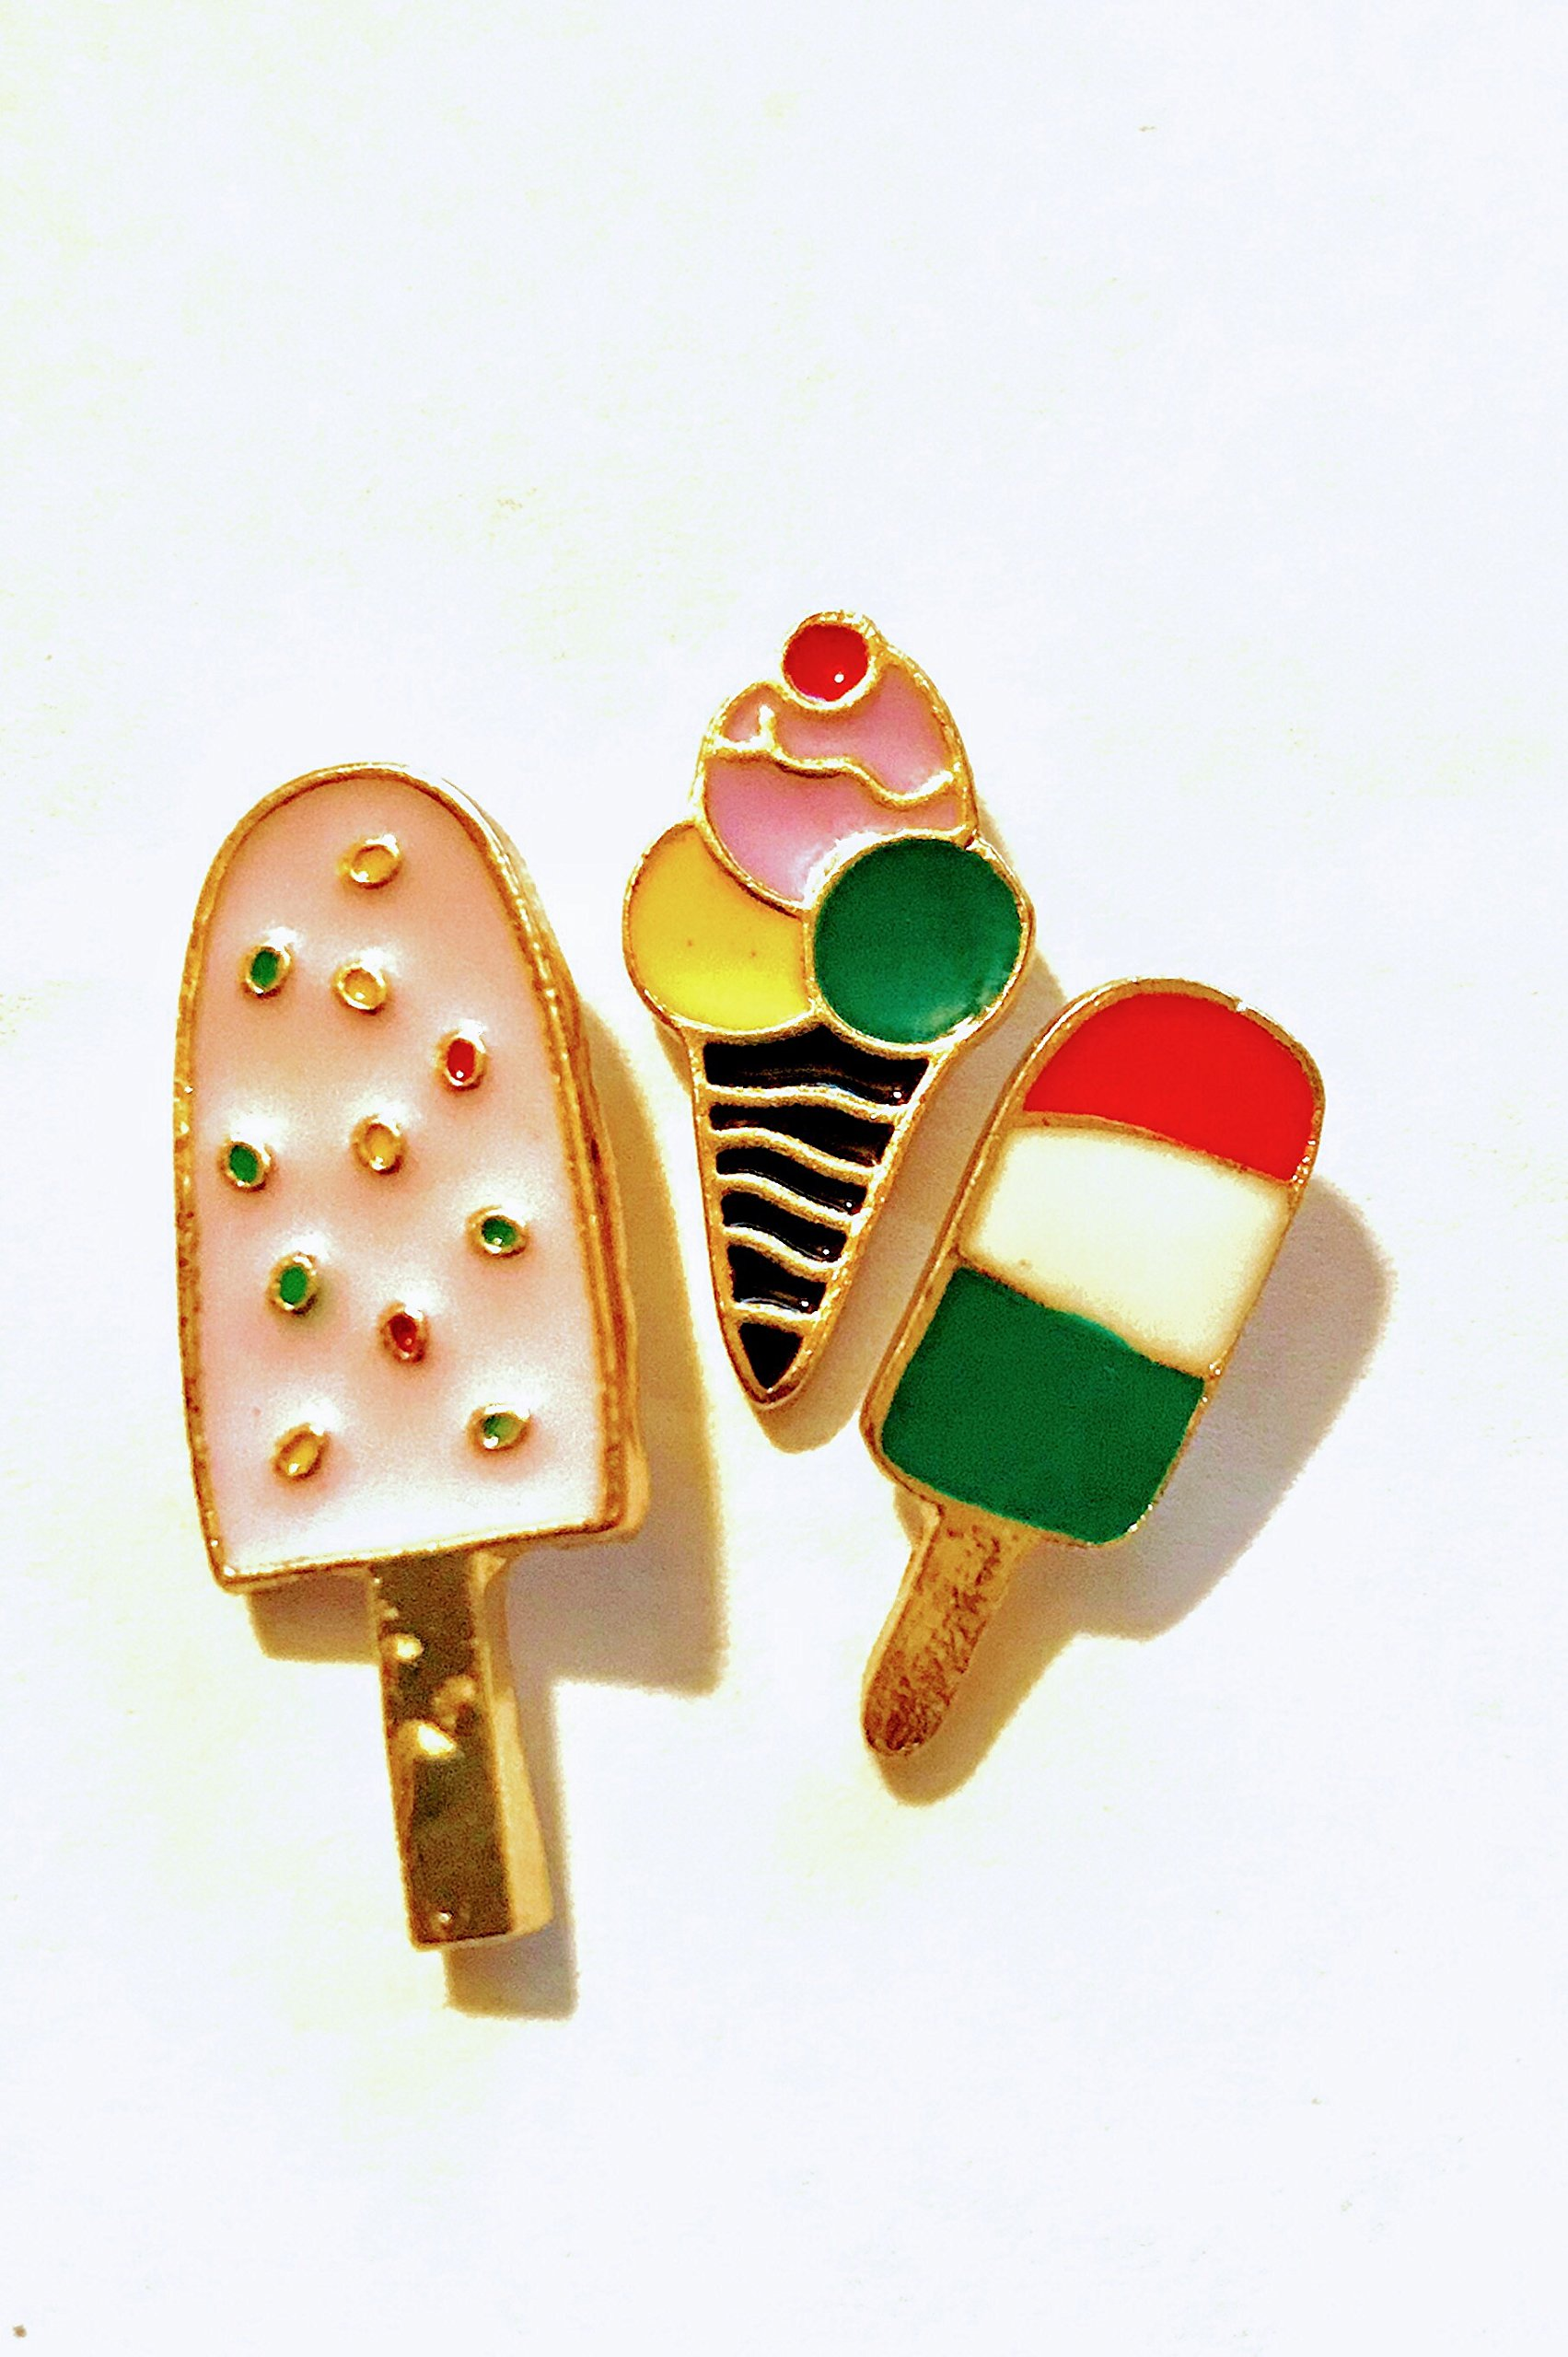 Summer Treats Popsicle Ice Cream Enamel Lapel Pin Brooch Set